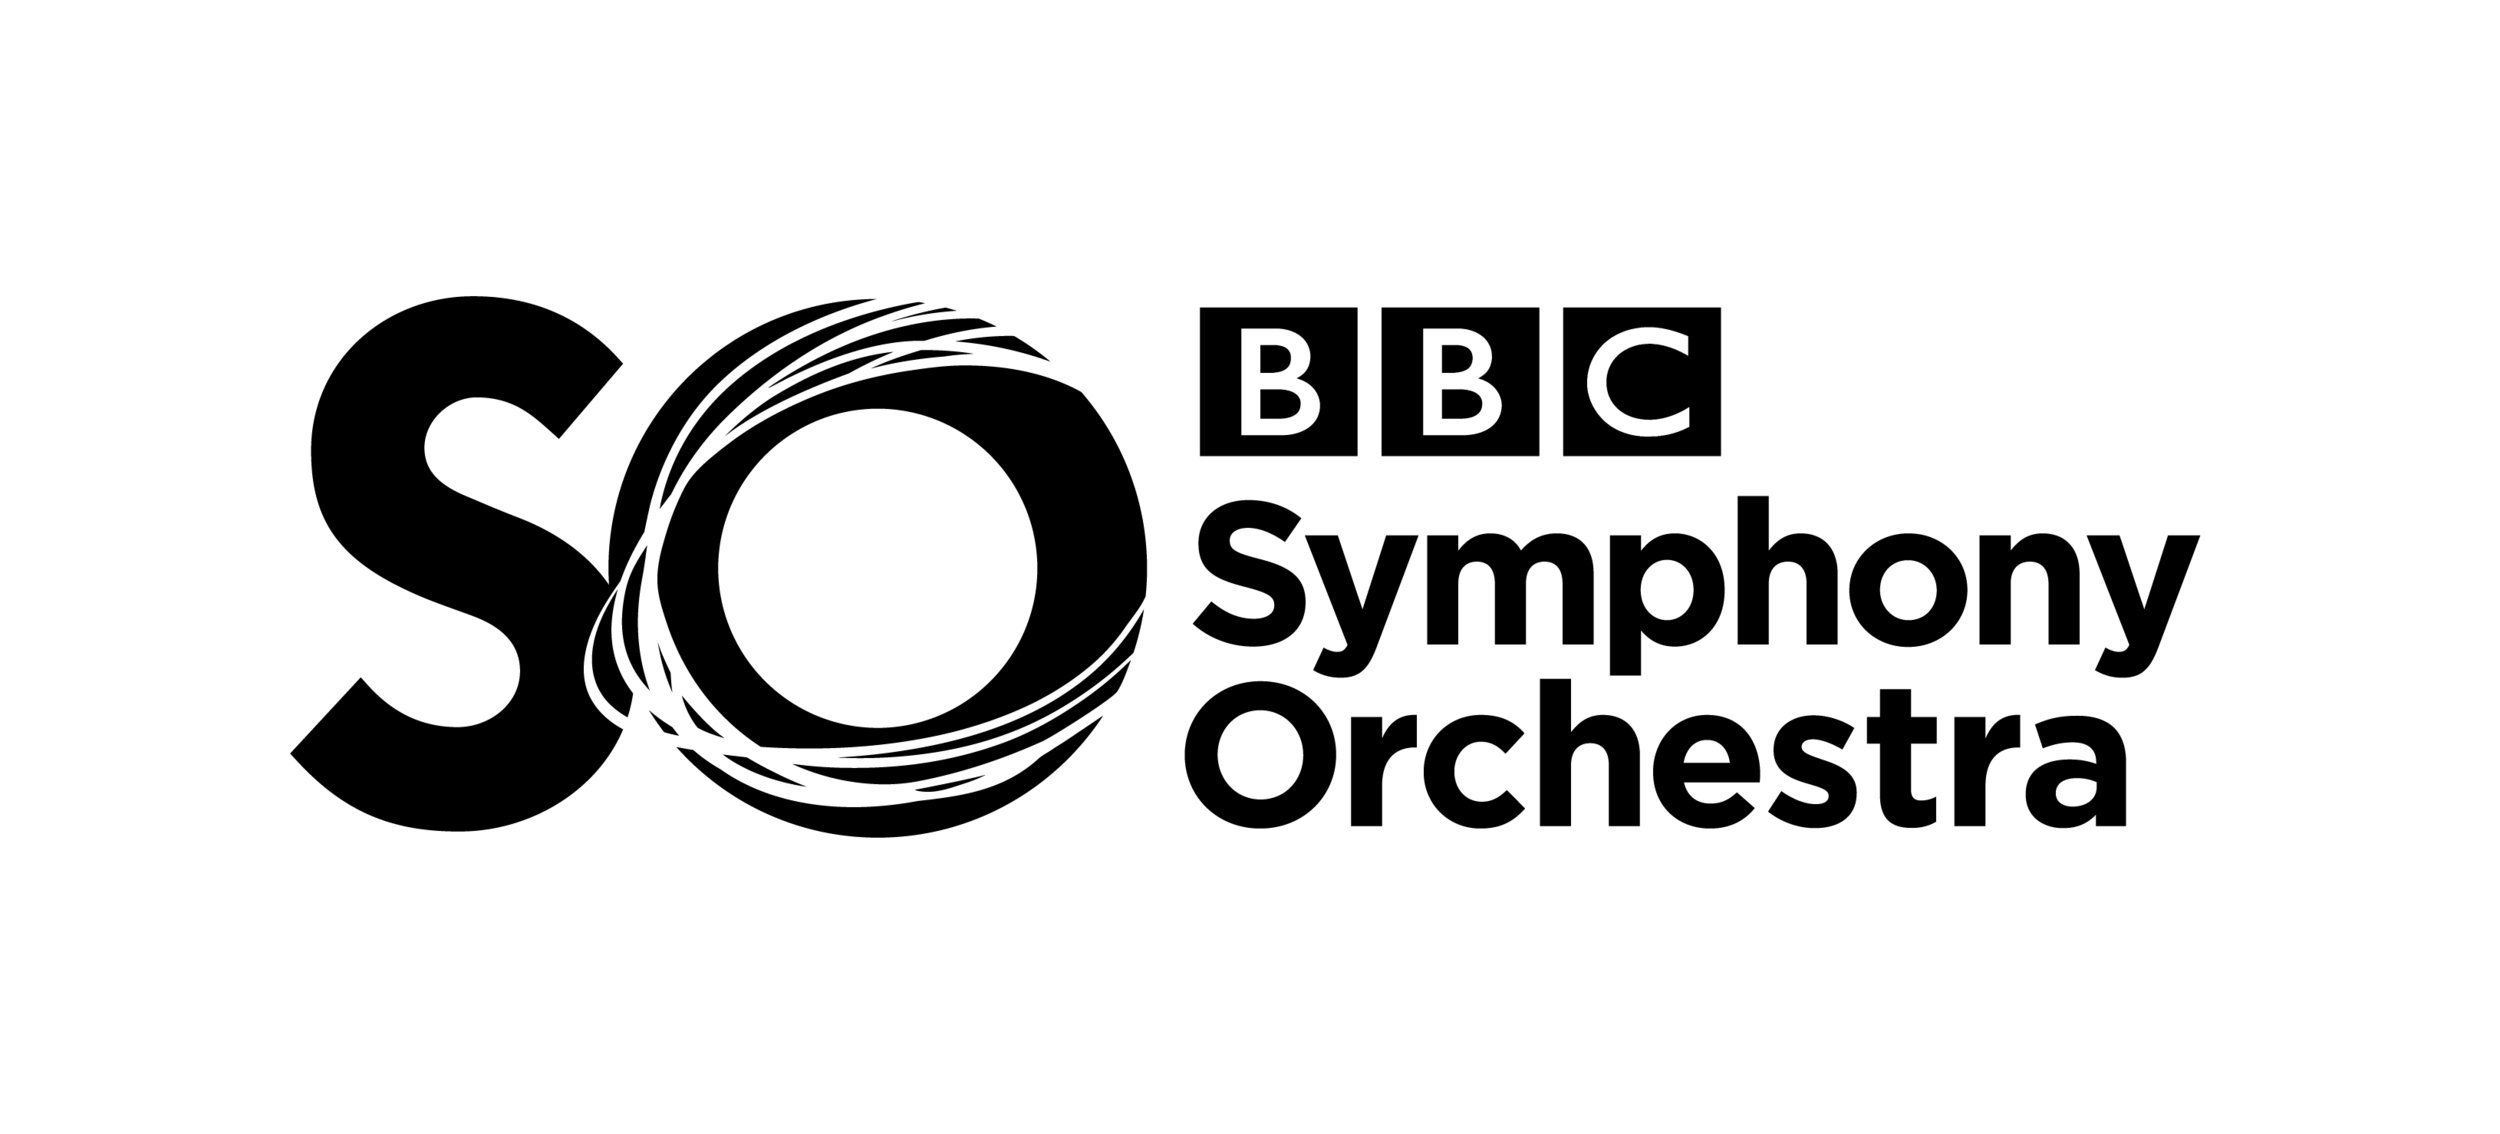 BBC_Symphony_Orchestra_Logo.jpg